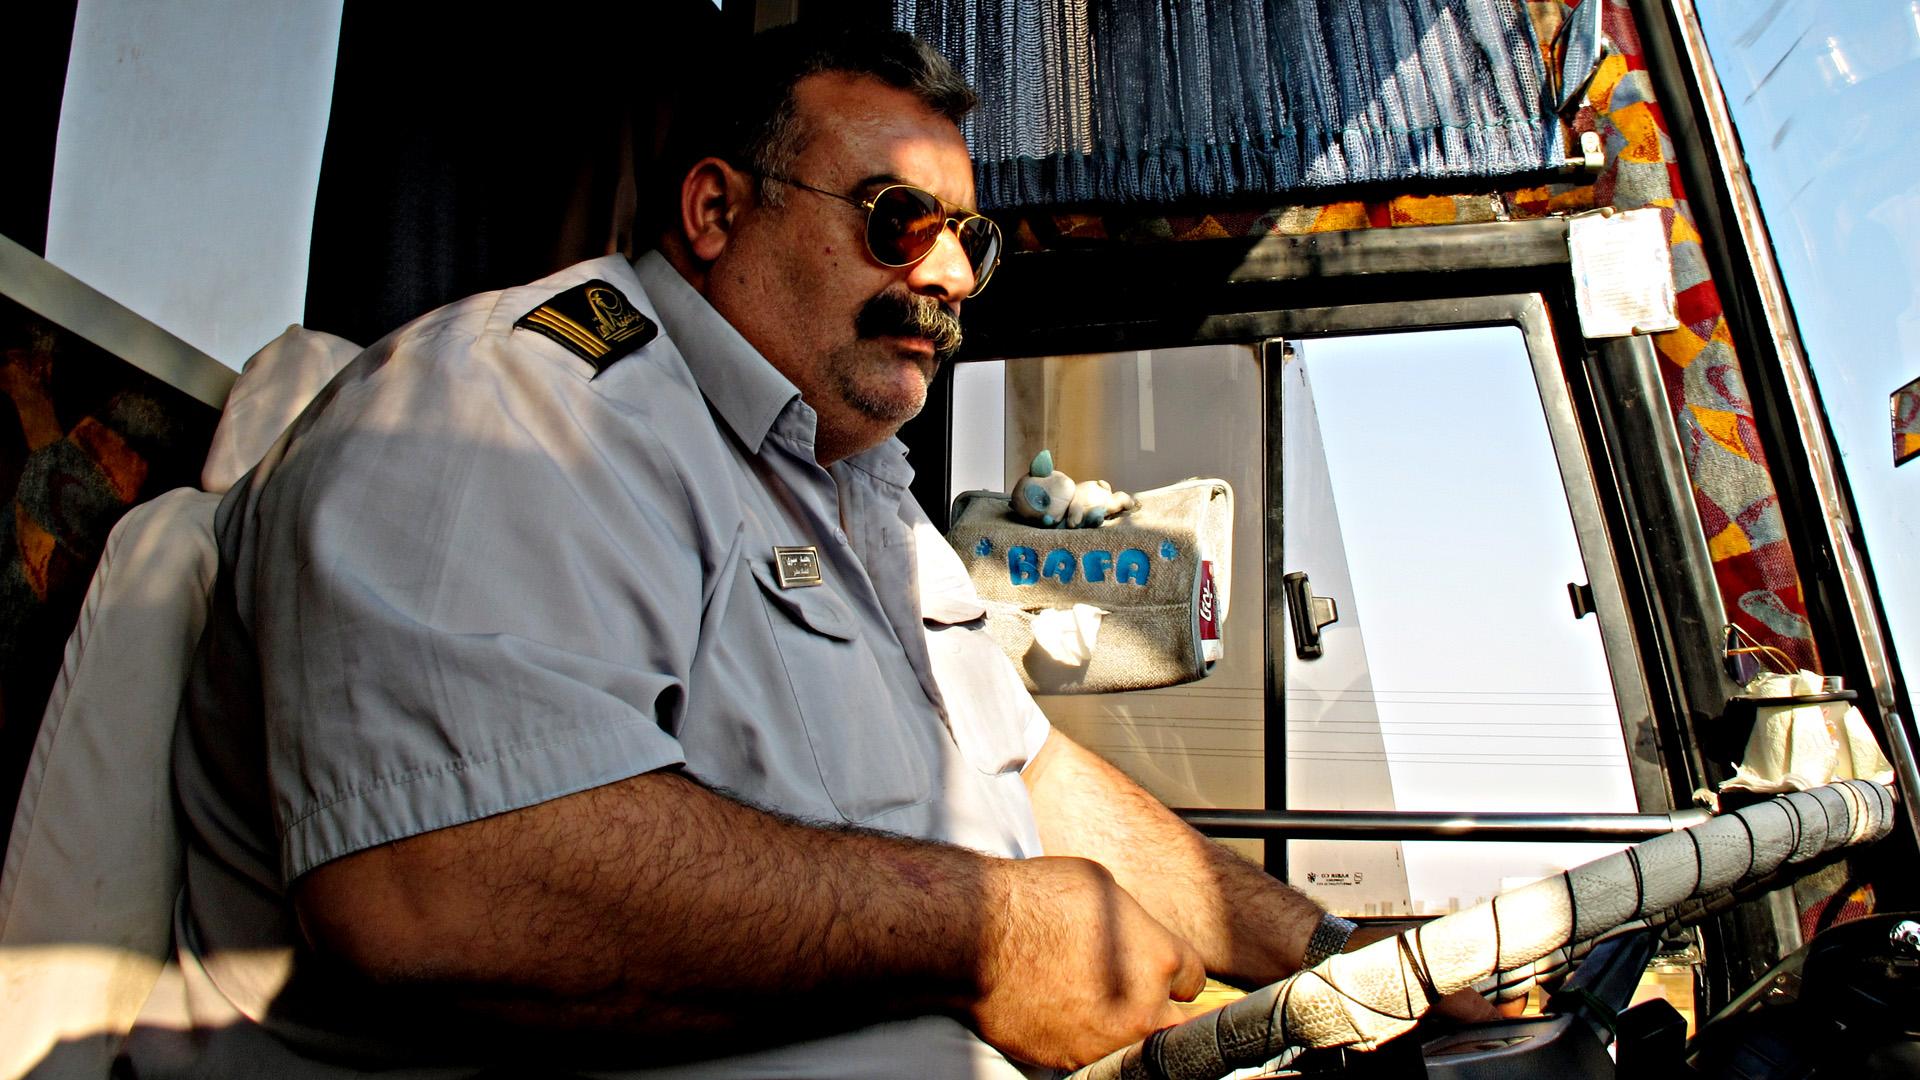 File:Bus driver (5171124305).jpg - Wikimedia Commons